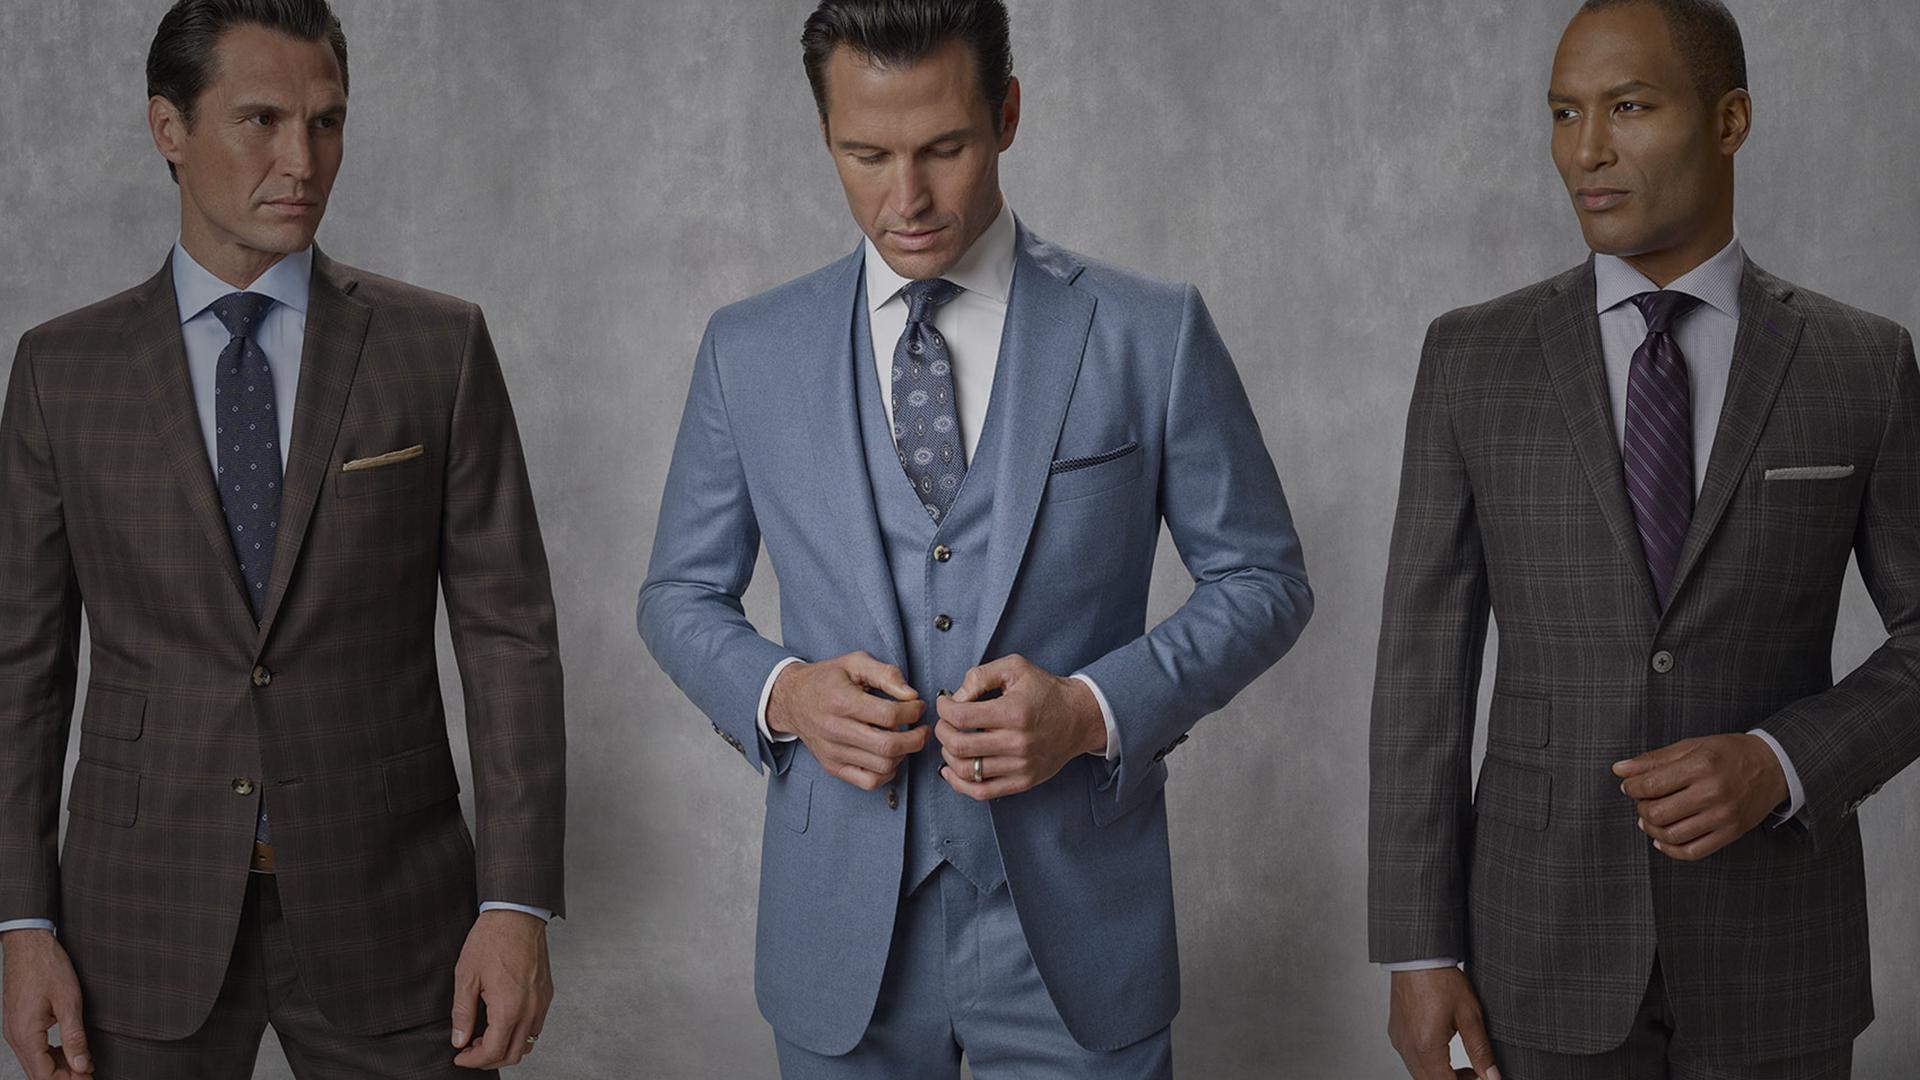 Tom James Company reviews   Formal Wear at One Far West, 3410 Far West Blvd - Austin TX